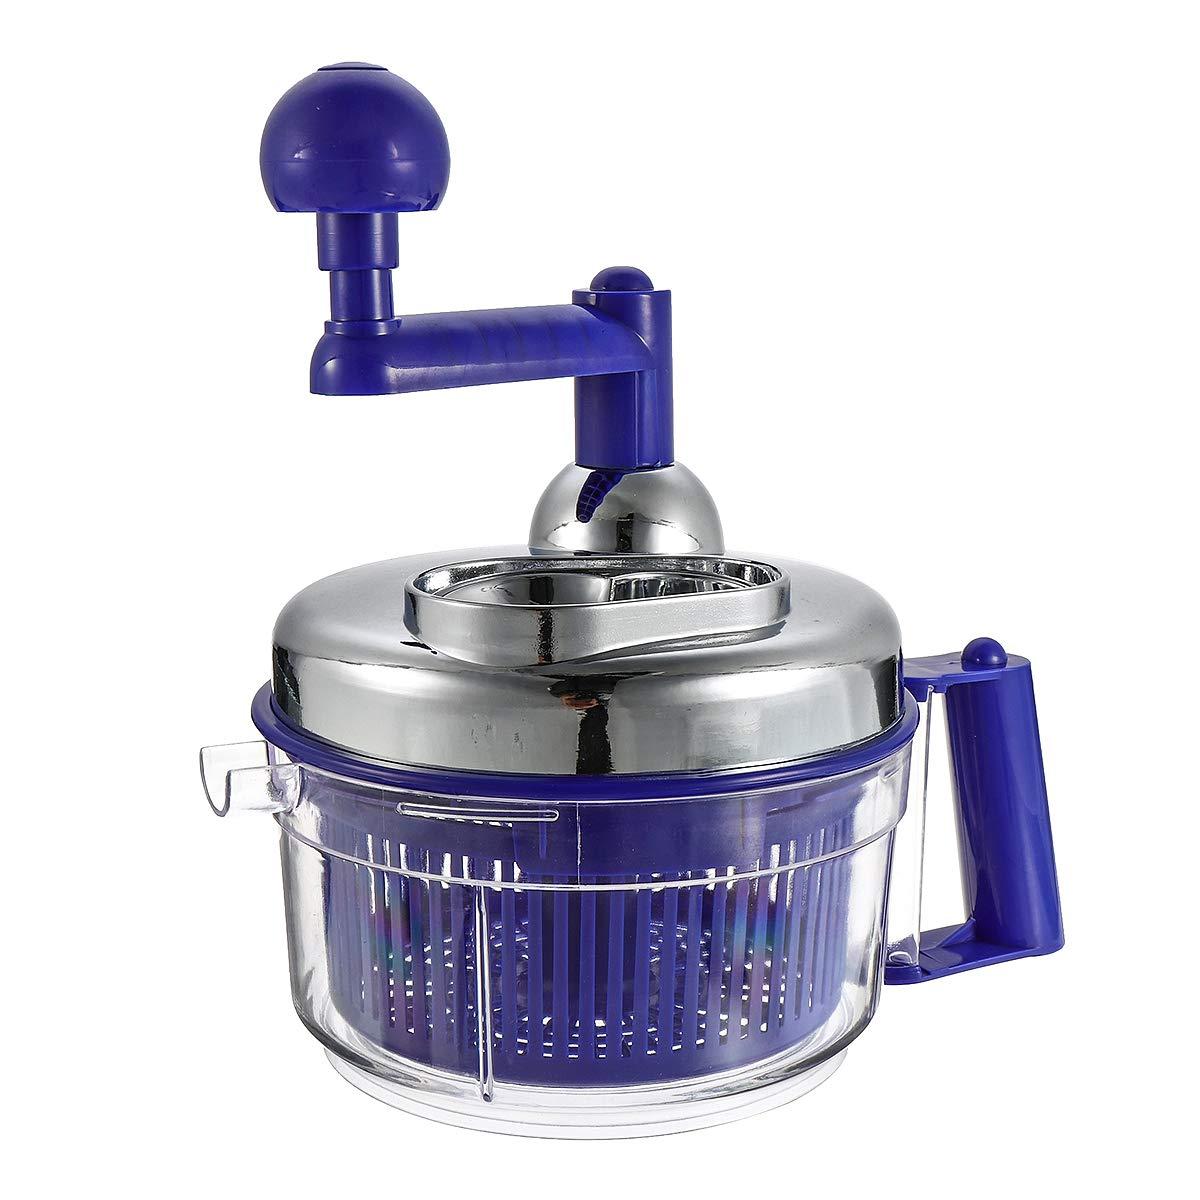 QIZIANG Manuelle Fleischwolf Mixer Prozessor Gemüseschneider Chopper Maker Küche Küche Küche Fleischwolf Multifunktions Hot B07Q5F3YH5 Multifunktionswerkzeuge Aktuelle Form 054a0d